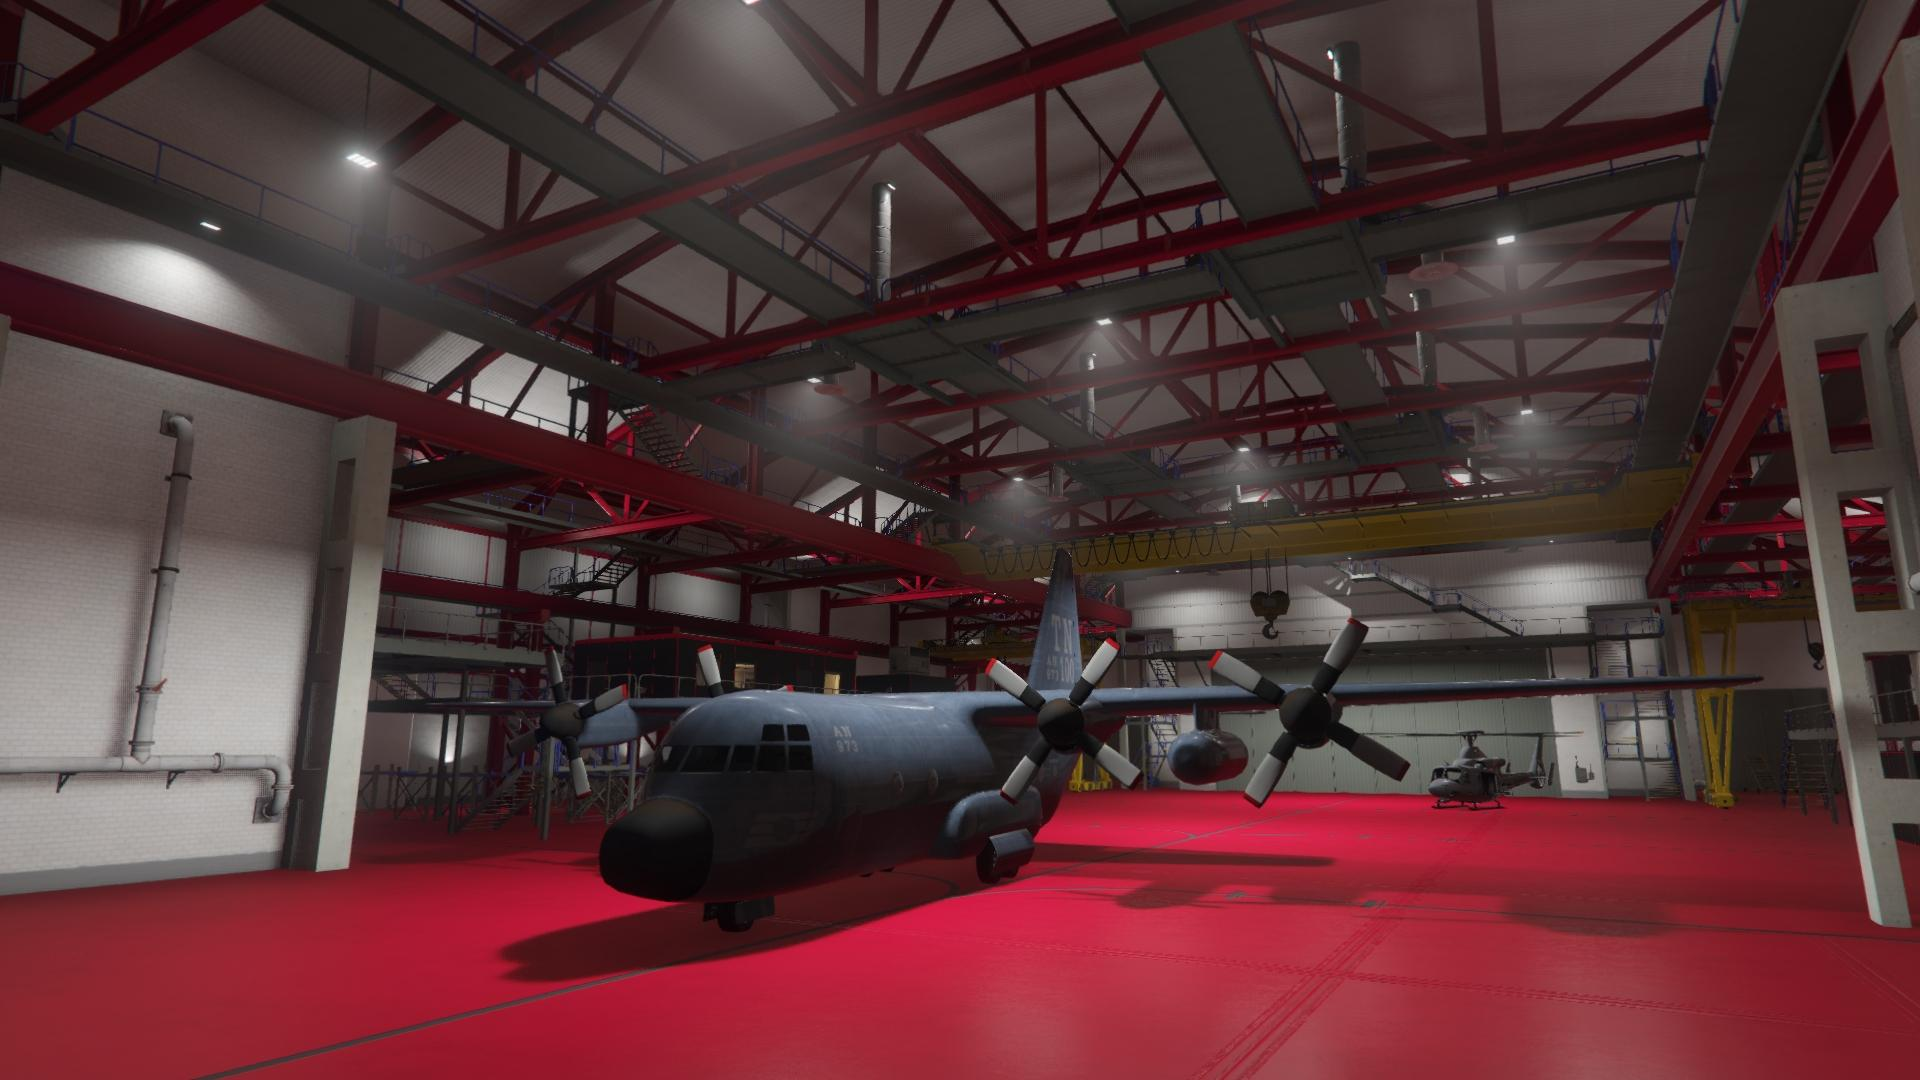 Fort Zancudo Hangar 3497  GTA Online Properties  GTA V